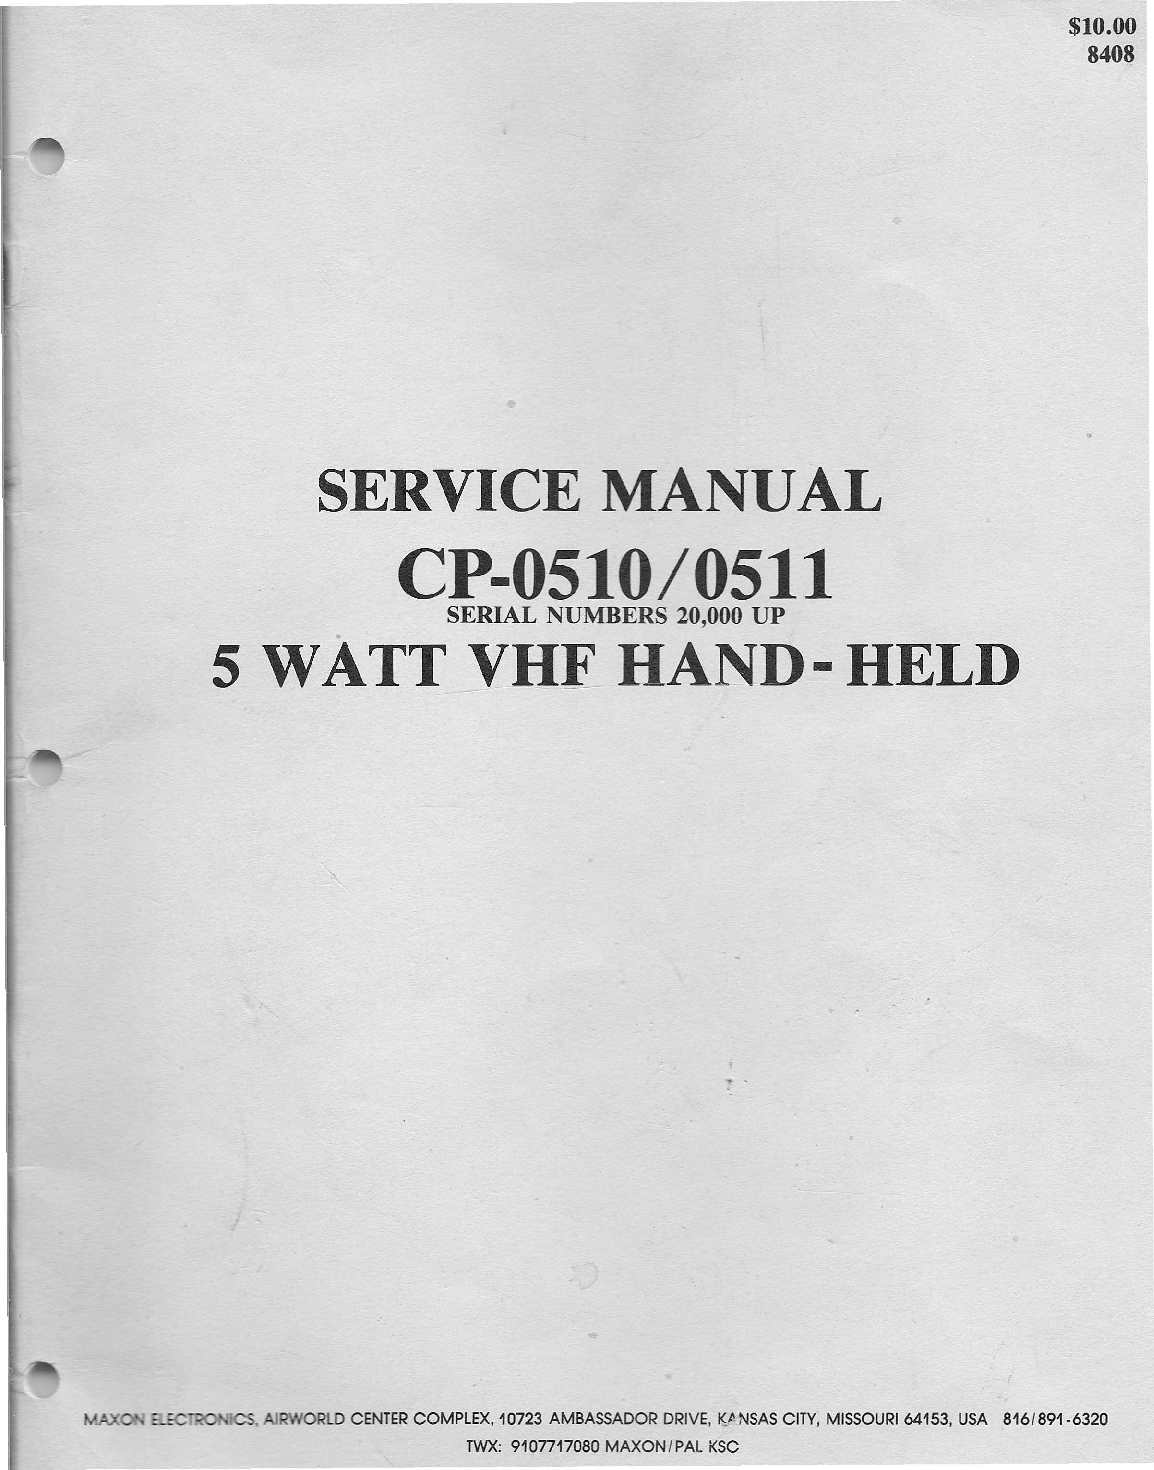 maxon microphone wiring diagram calam  o cp 0510 0511 5 watt vhf handheld service manual  cp 0510 0511 5 watt vhf handheld